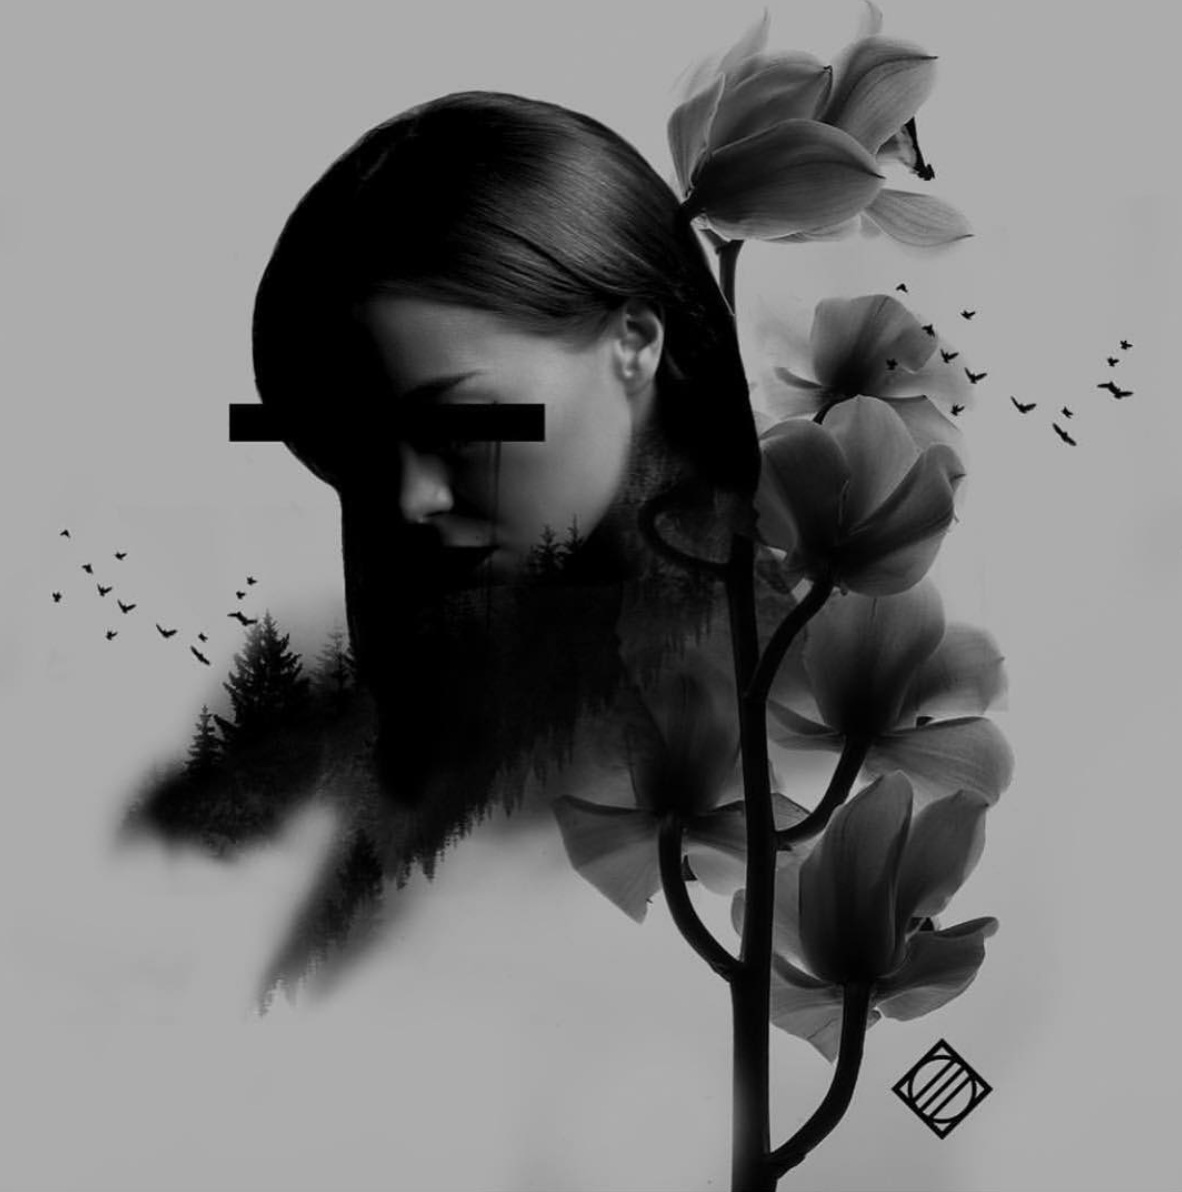 Digital+Artwork+by+Mark+Penacerrada